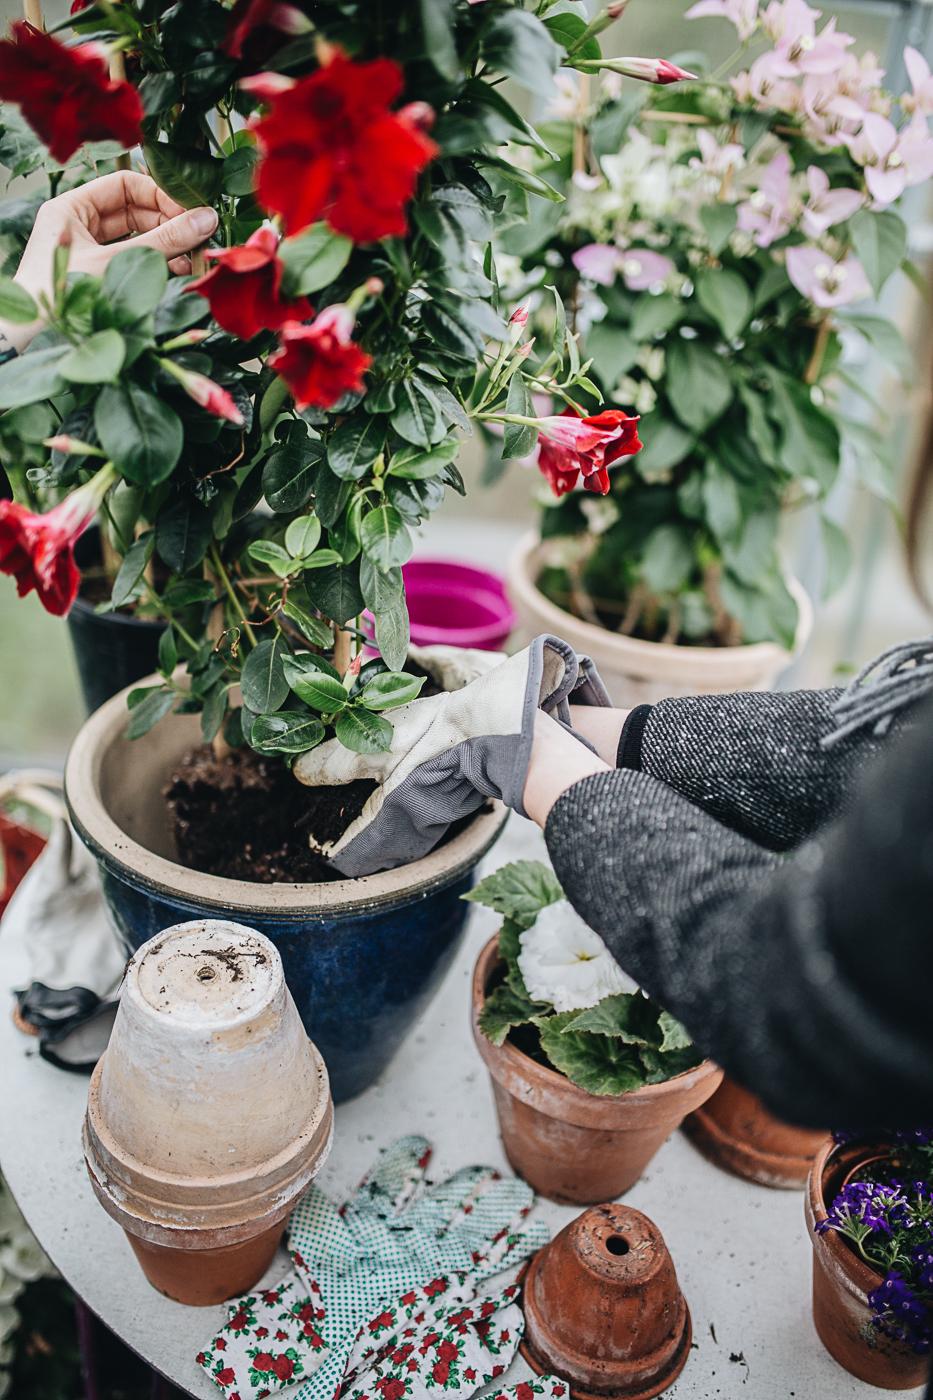 Happy Gardening 2019!